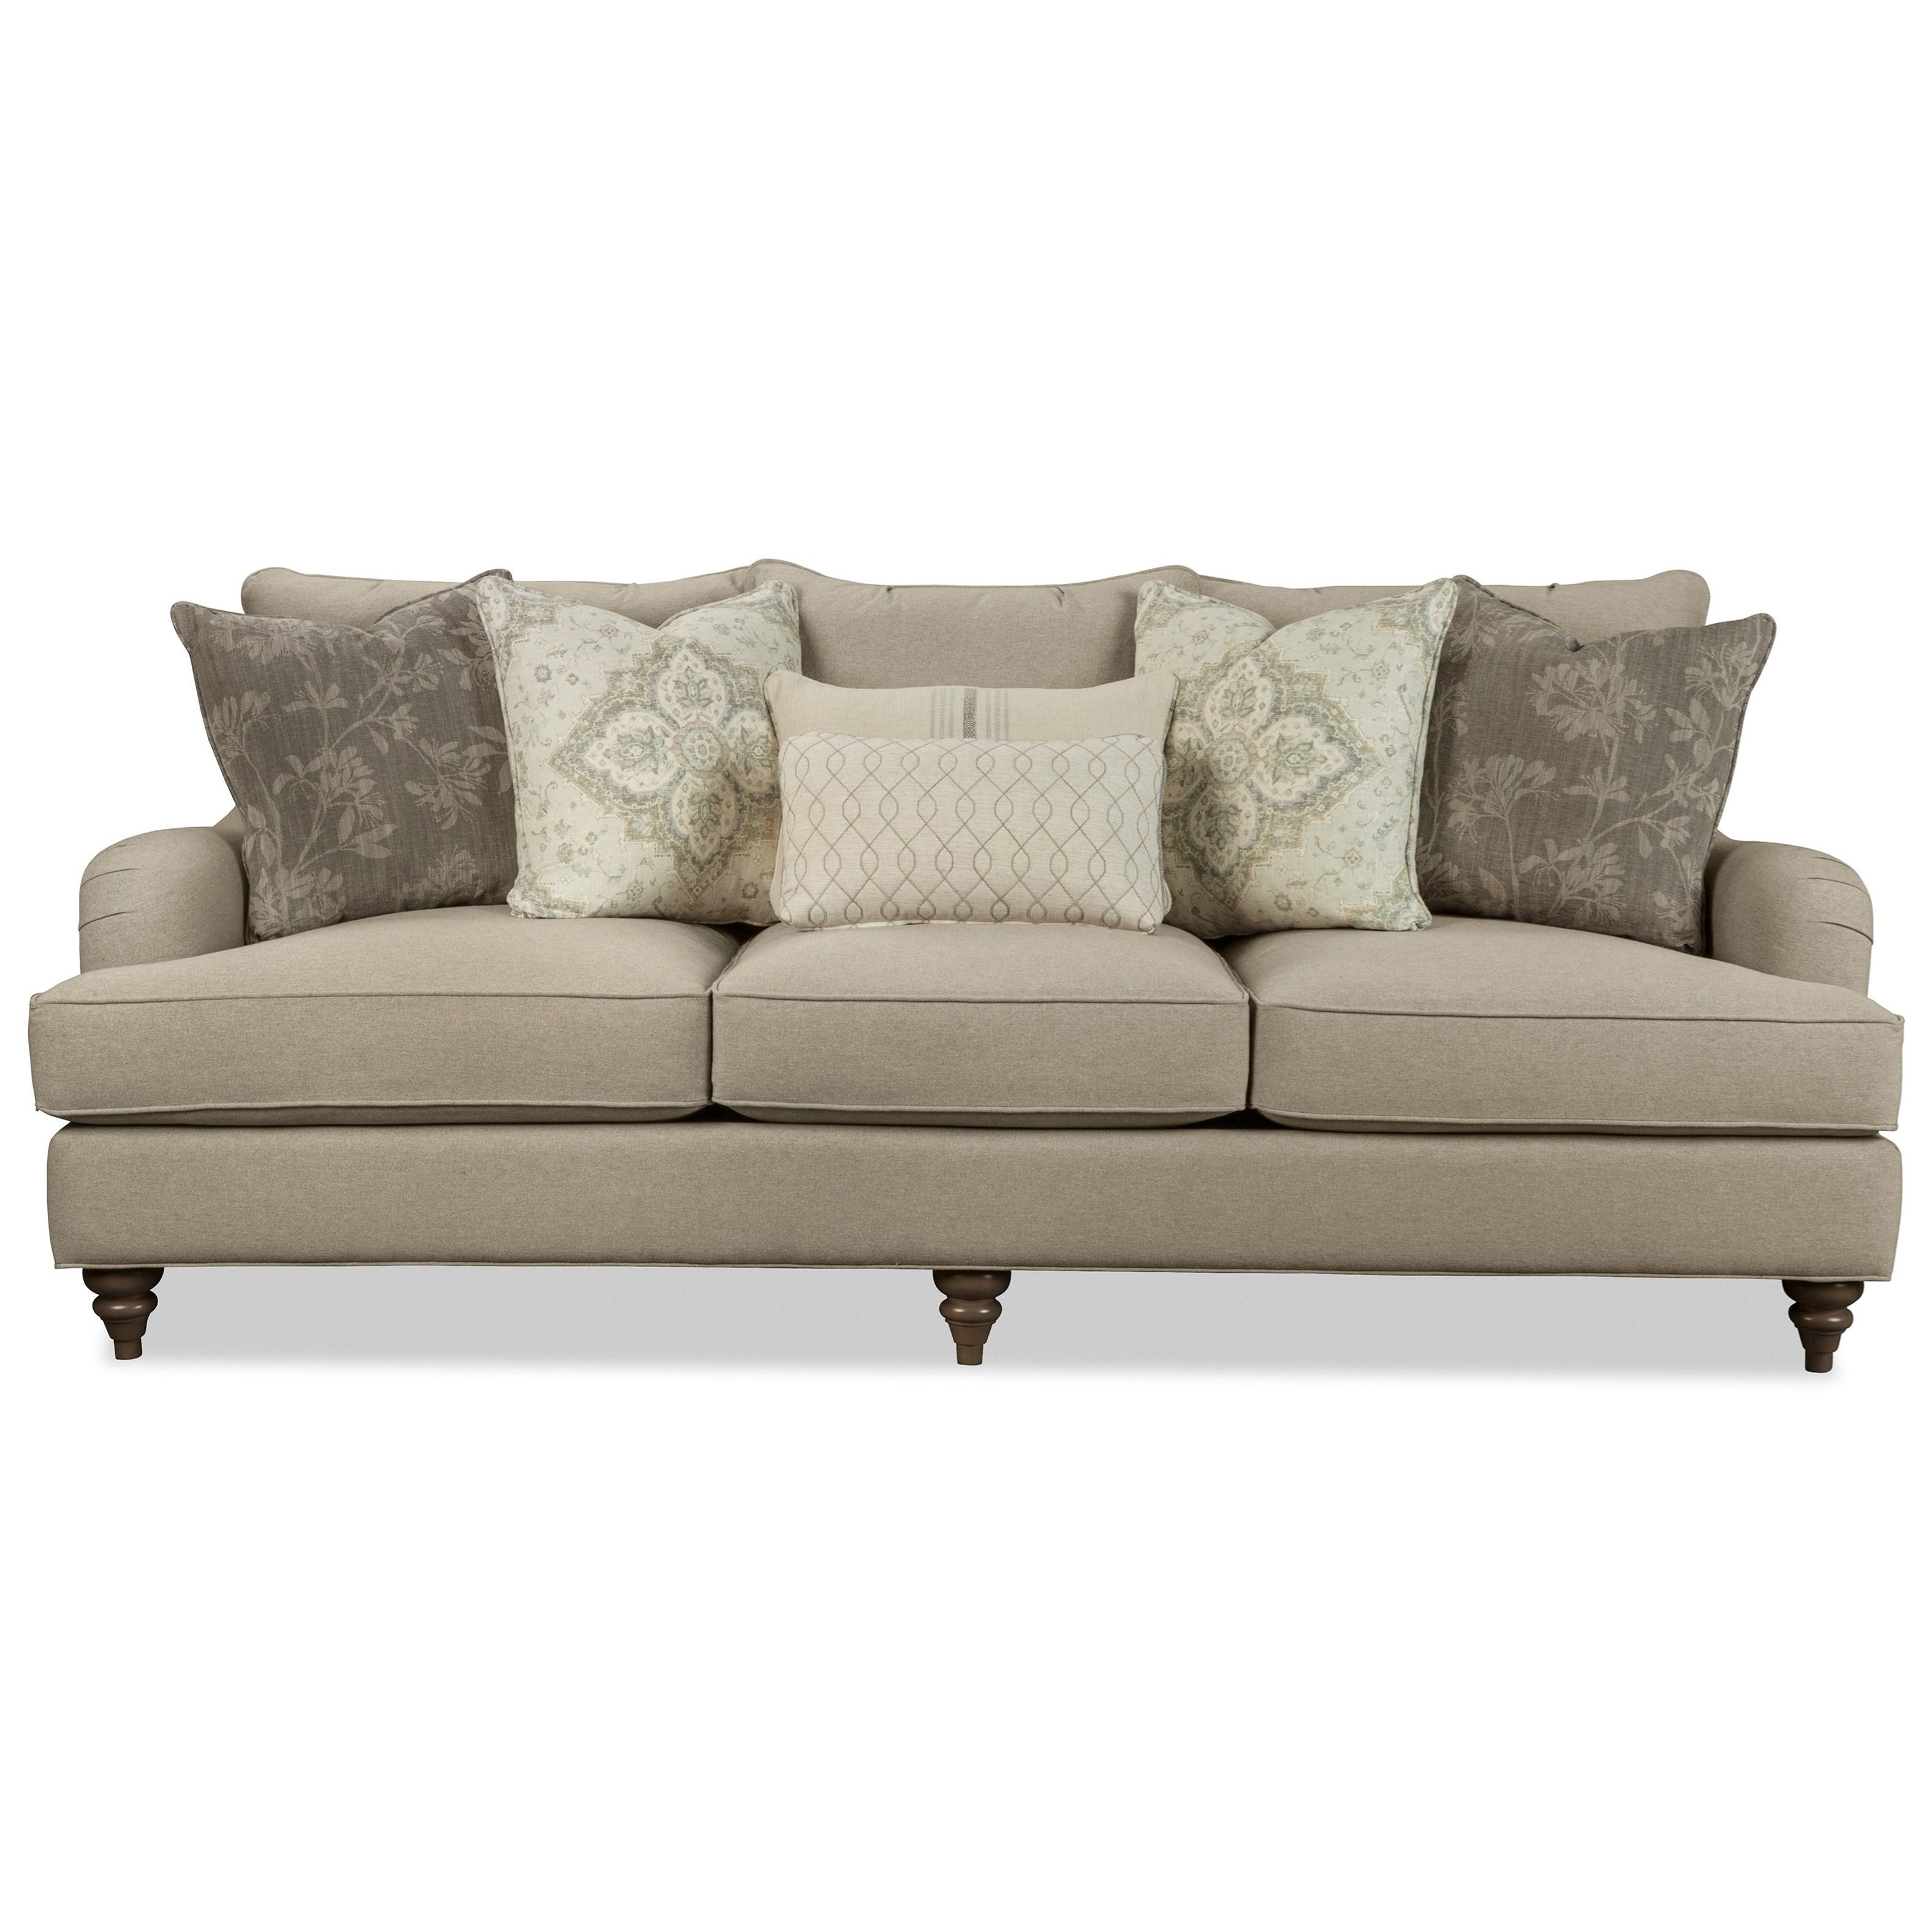 P773650BD 98 Inch Sofa by Paula Deen by Craftmaster at Zak's Home